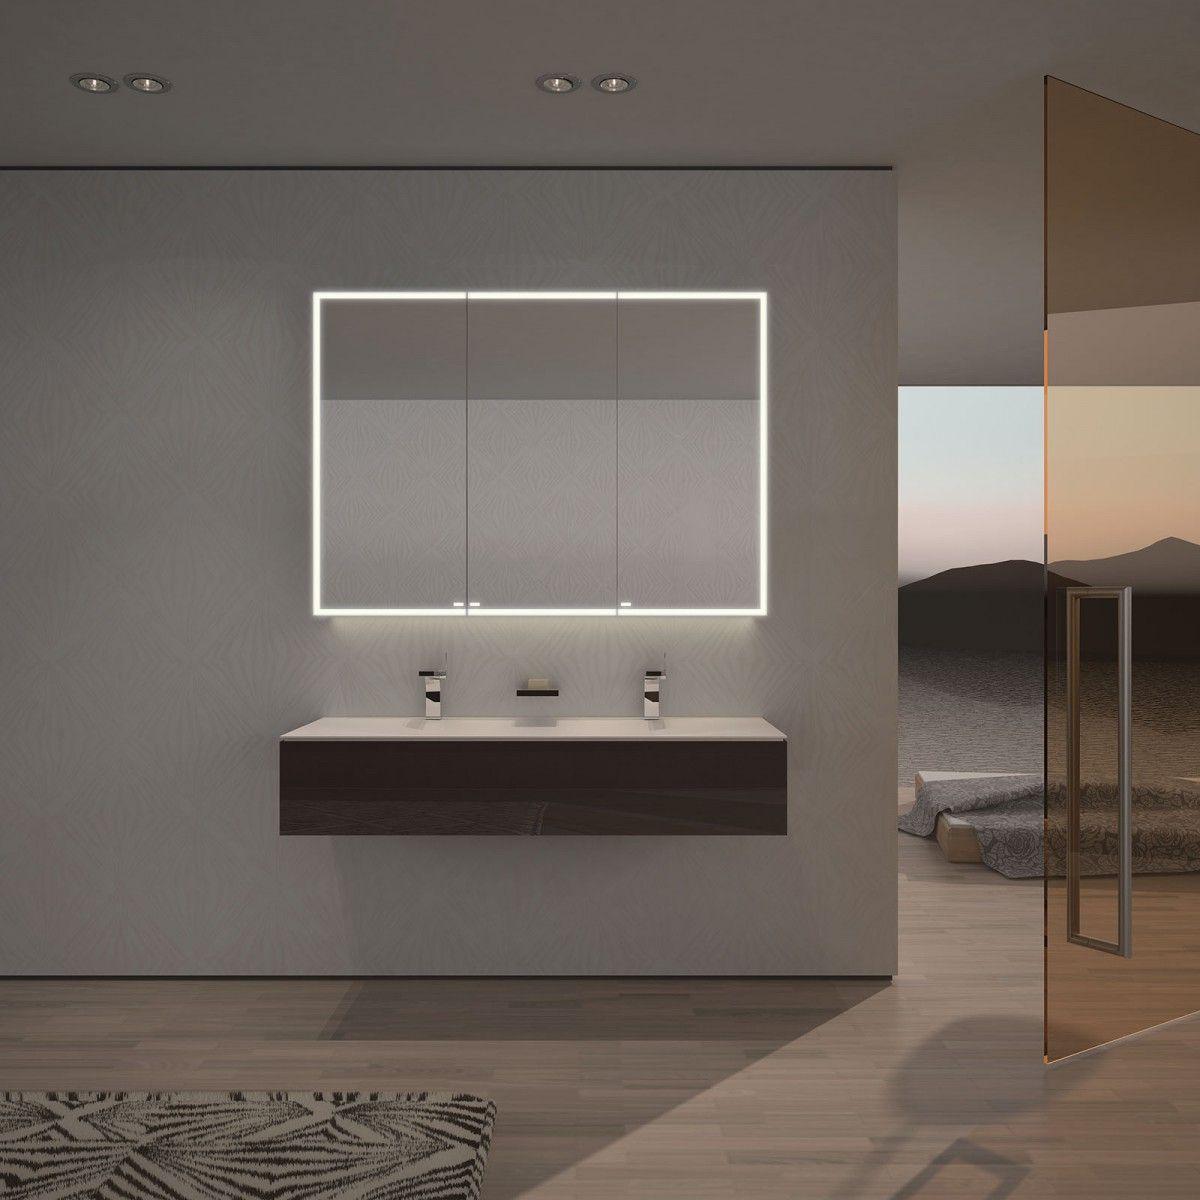 spiegelschrank nach ma mit led credo badezimmer pinterest spiegelschrank led und badezimmer. Black Bedroom Furniture Sets. Home Design Ideas